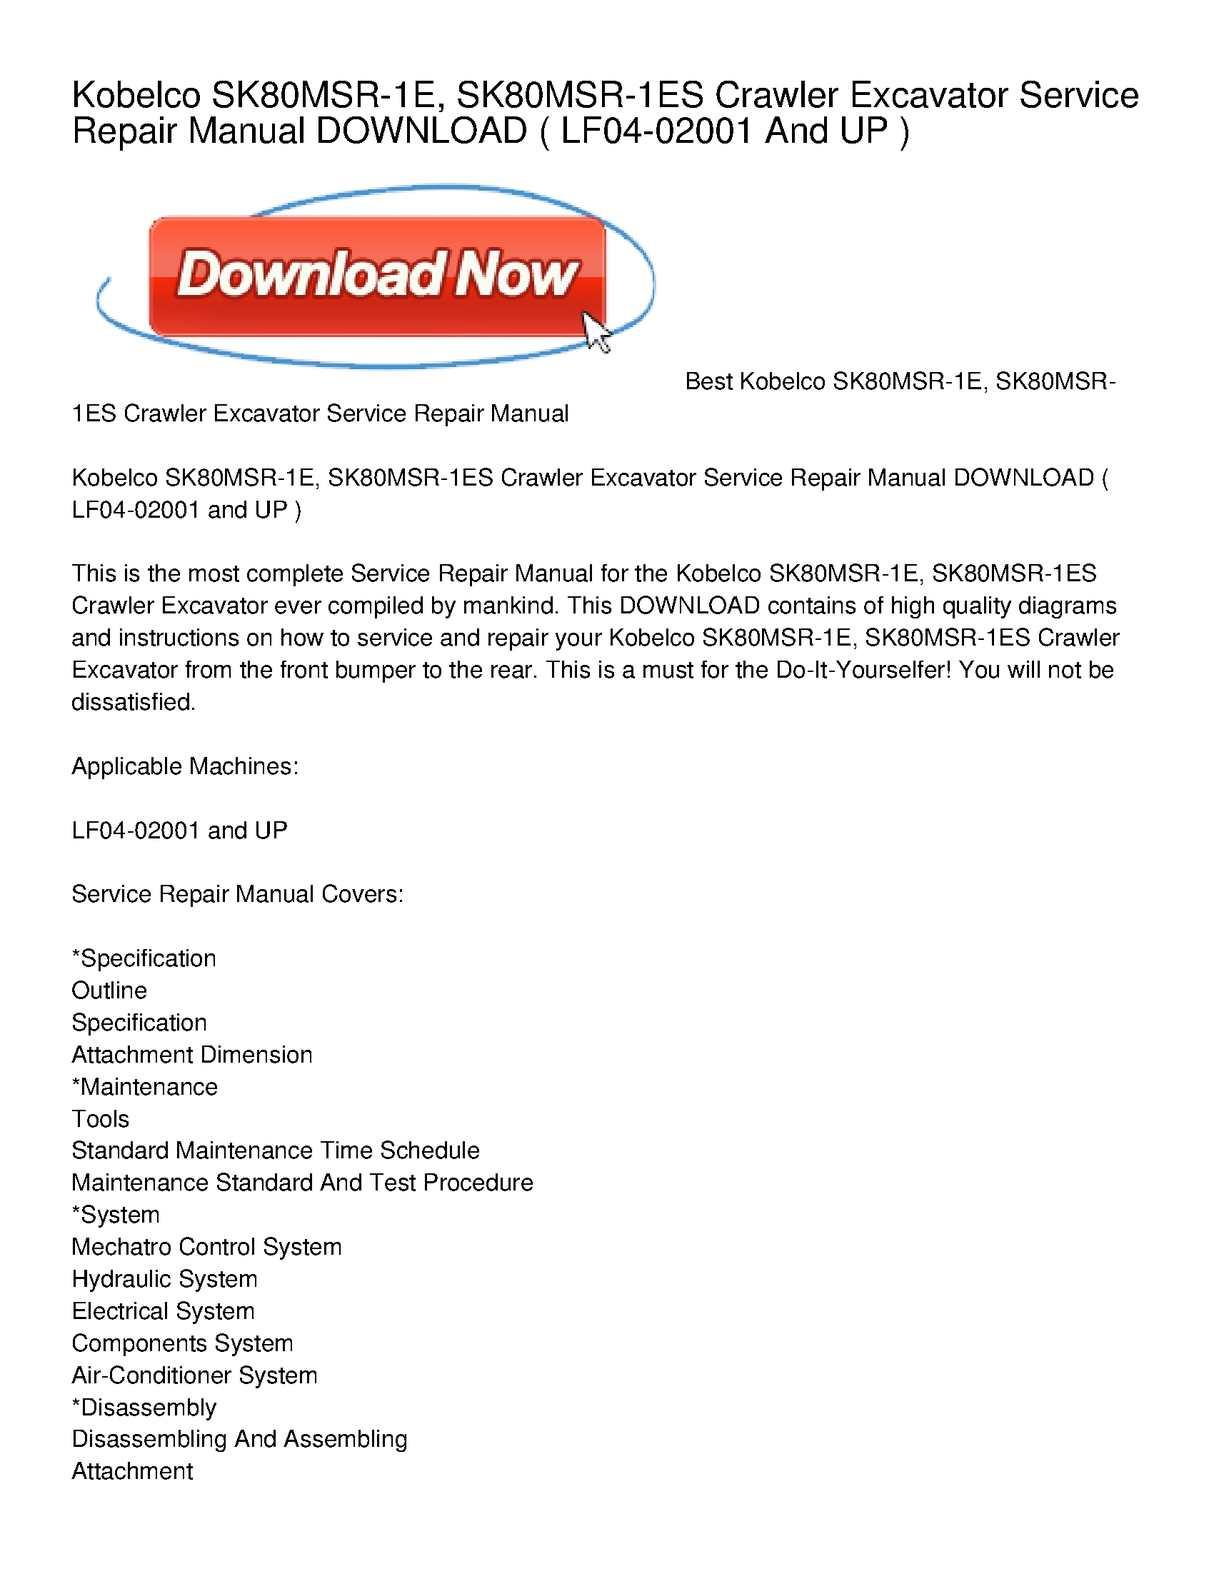 Calaméo - Kobelco SK80MSR-1E, SK80MSR-1ES Crawler Excavator Service Repair  Manual DOWNLOAD